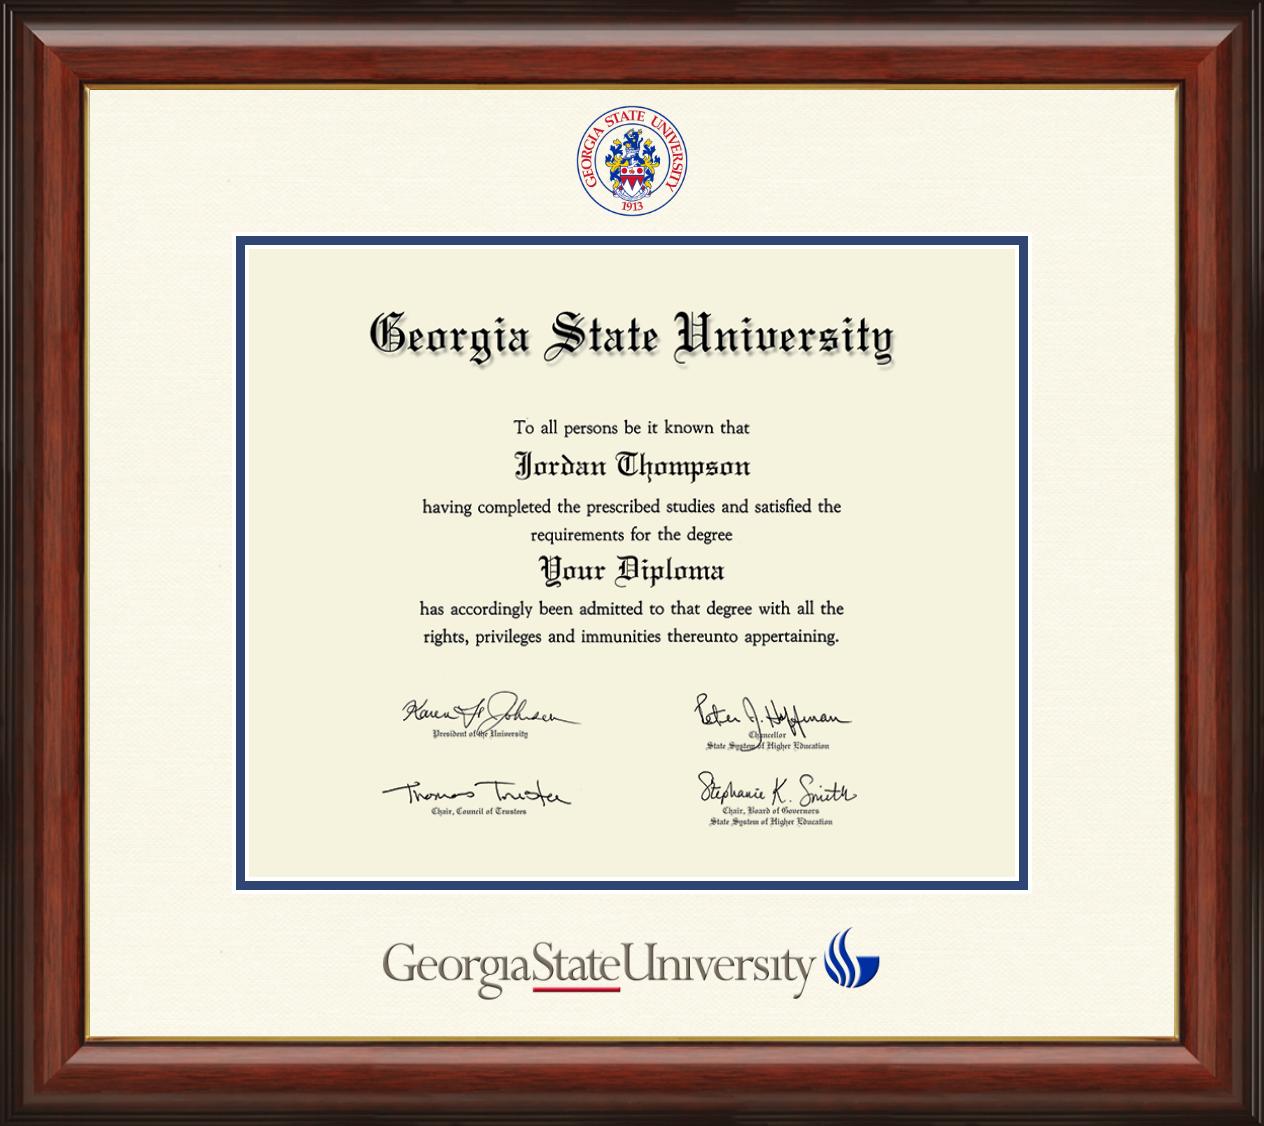 Georgia State University Diploma Frame For Georgia State University Holidays 2020